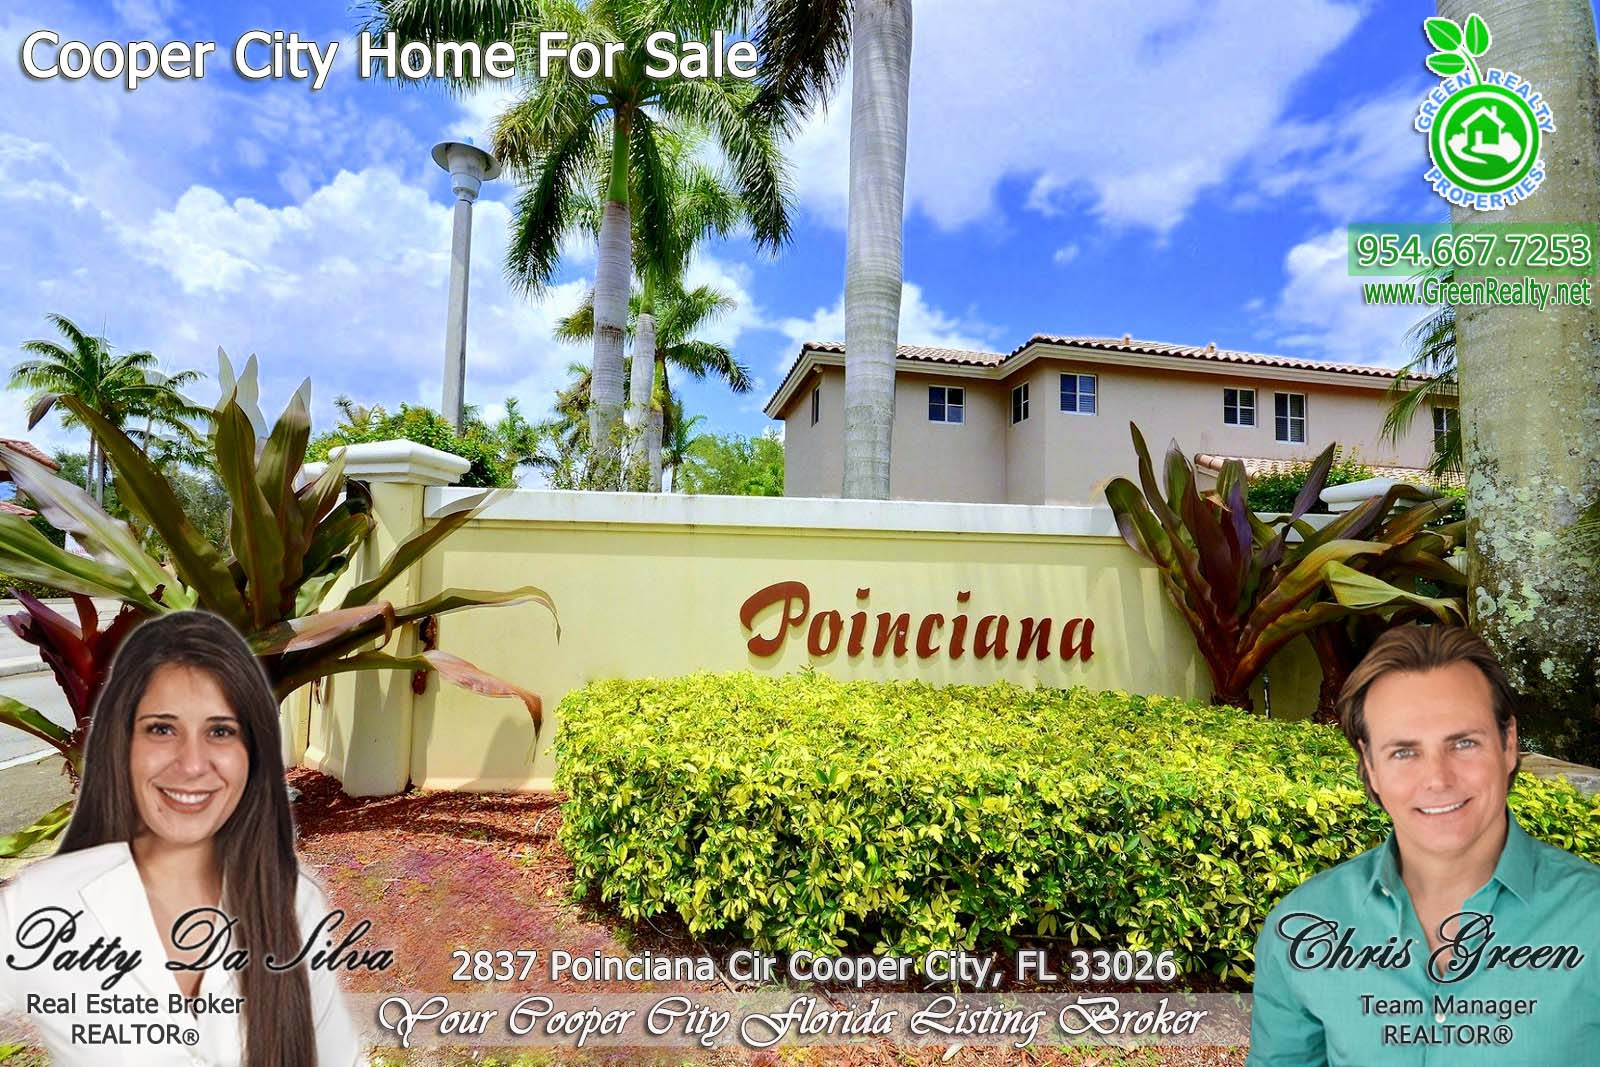 38 Poinciana Rock Creek Homes For Sale (1)